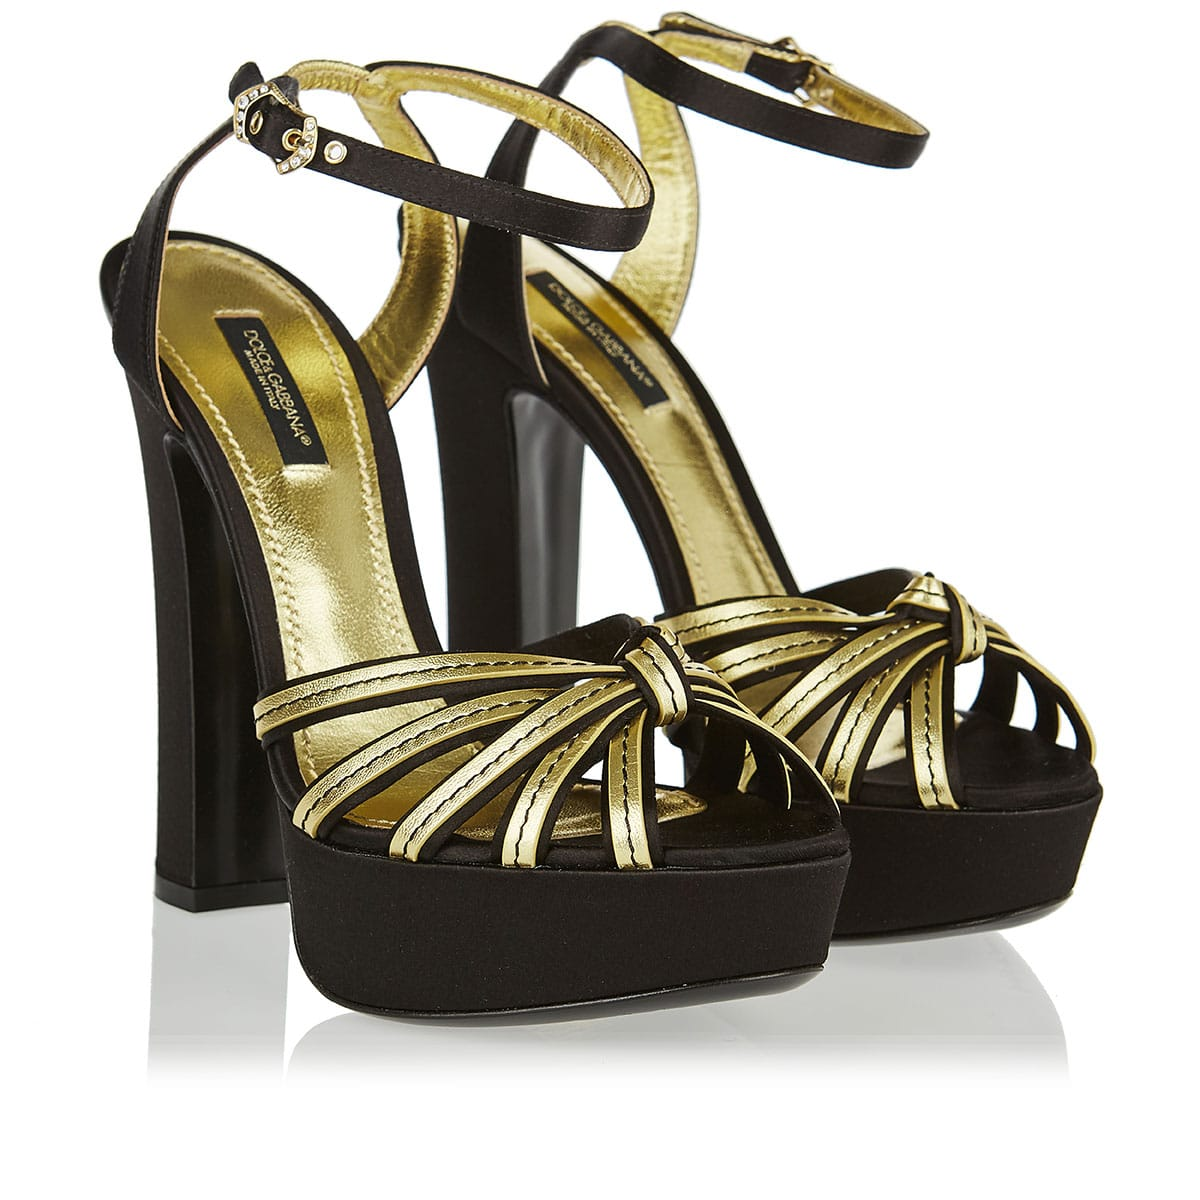 Bianca metallic leather and satin platform sandals